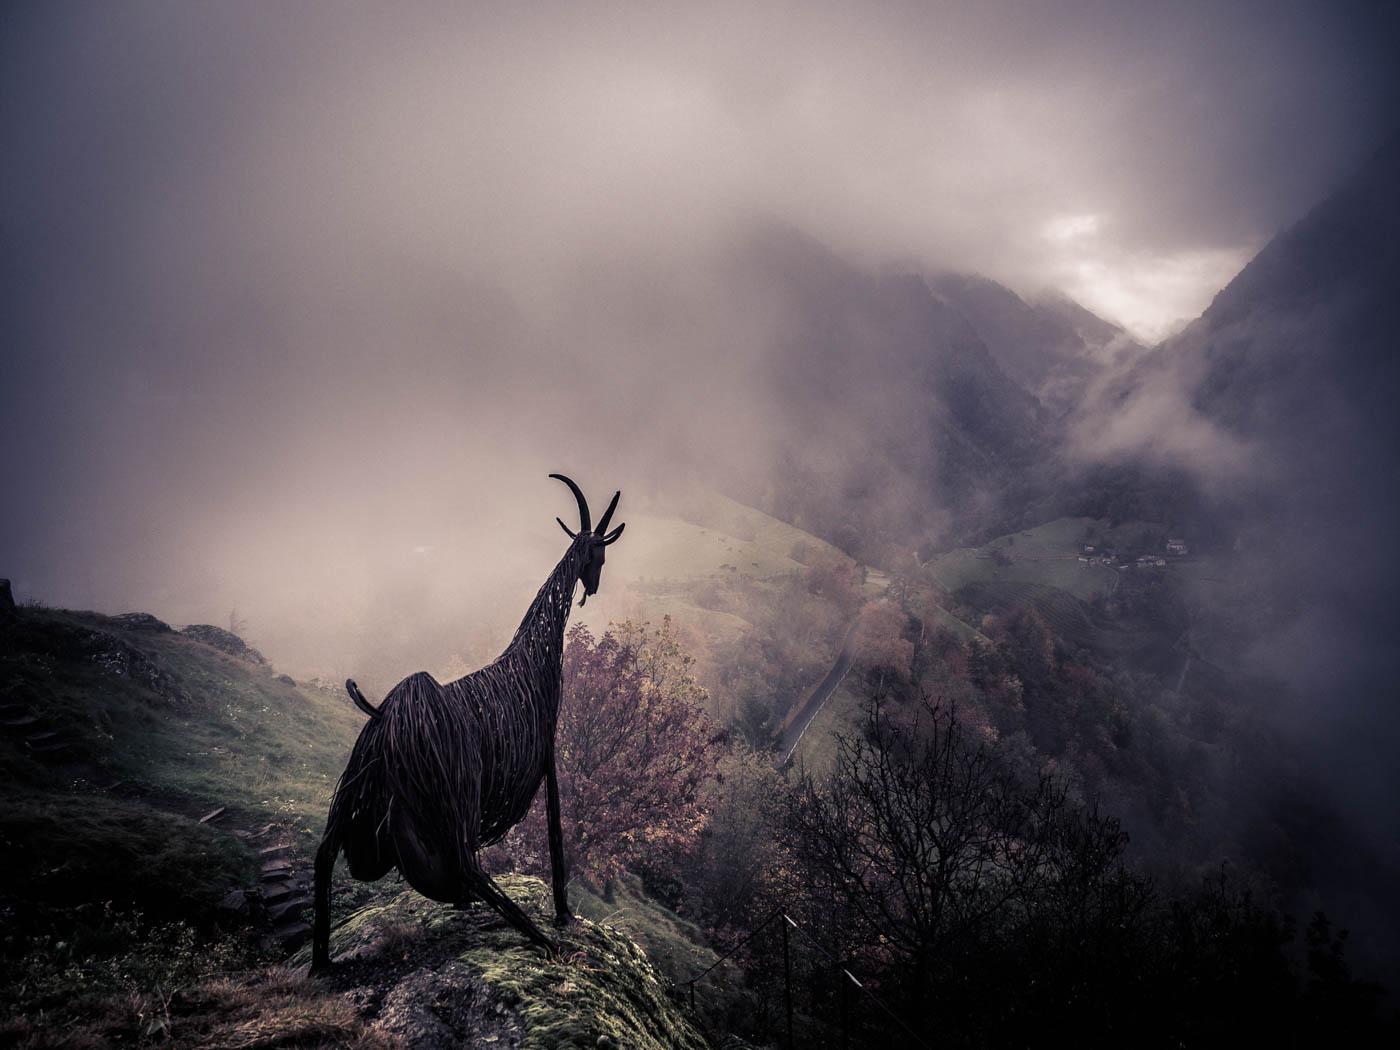 Geis im Nebel